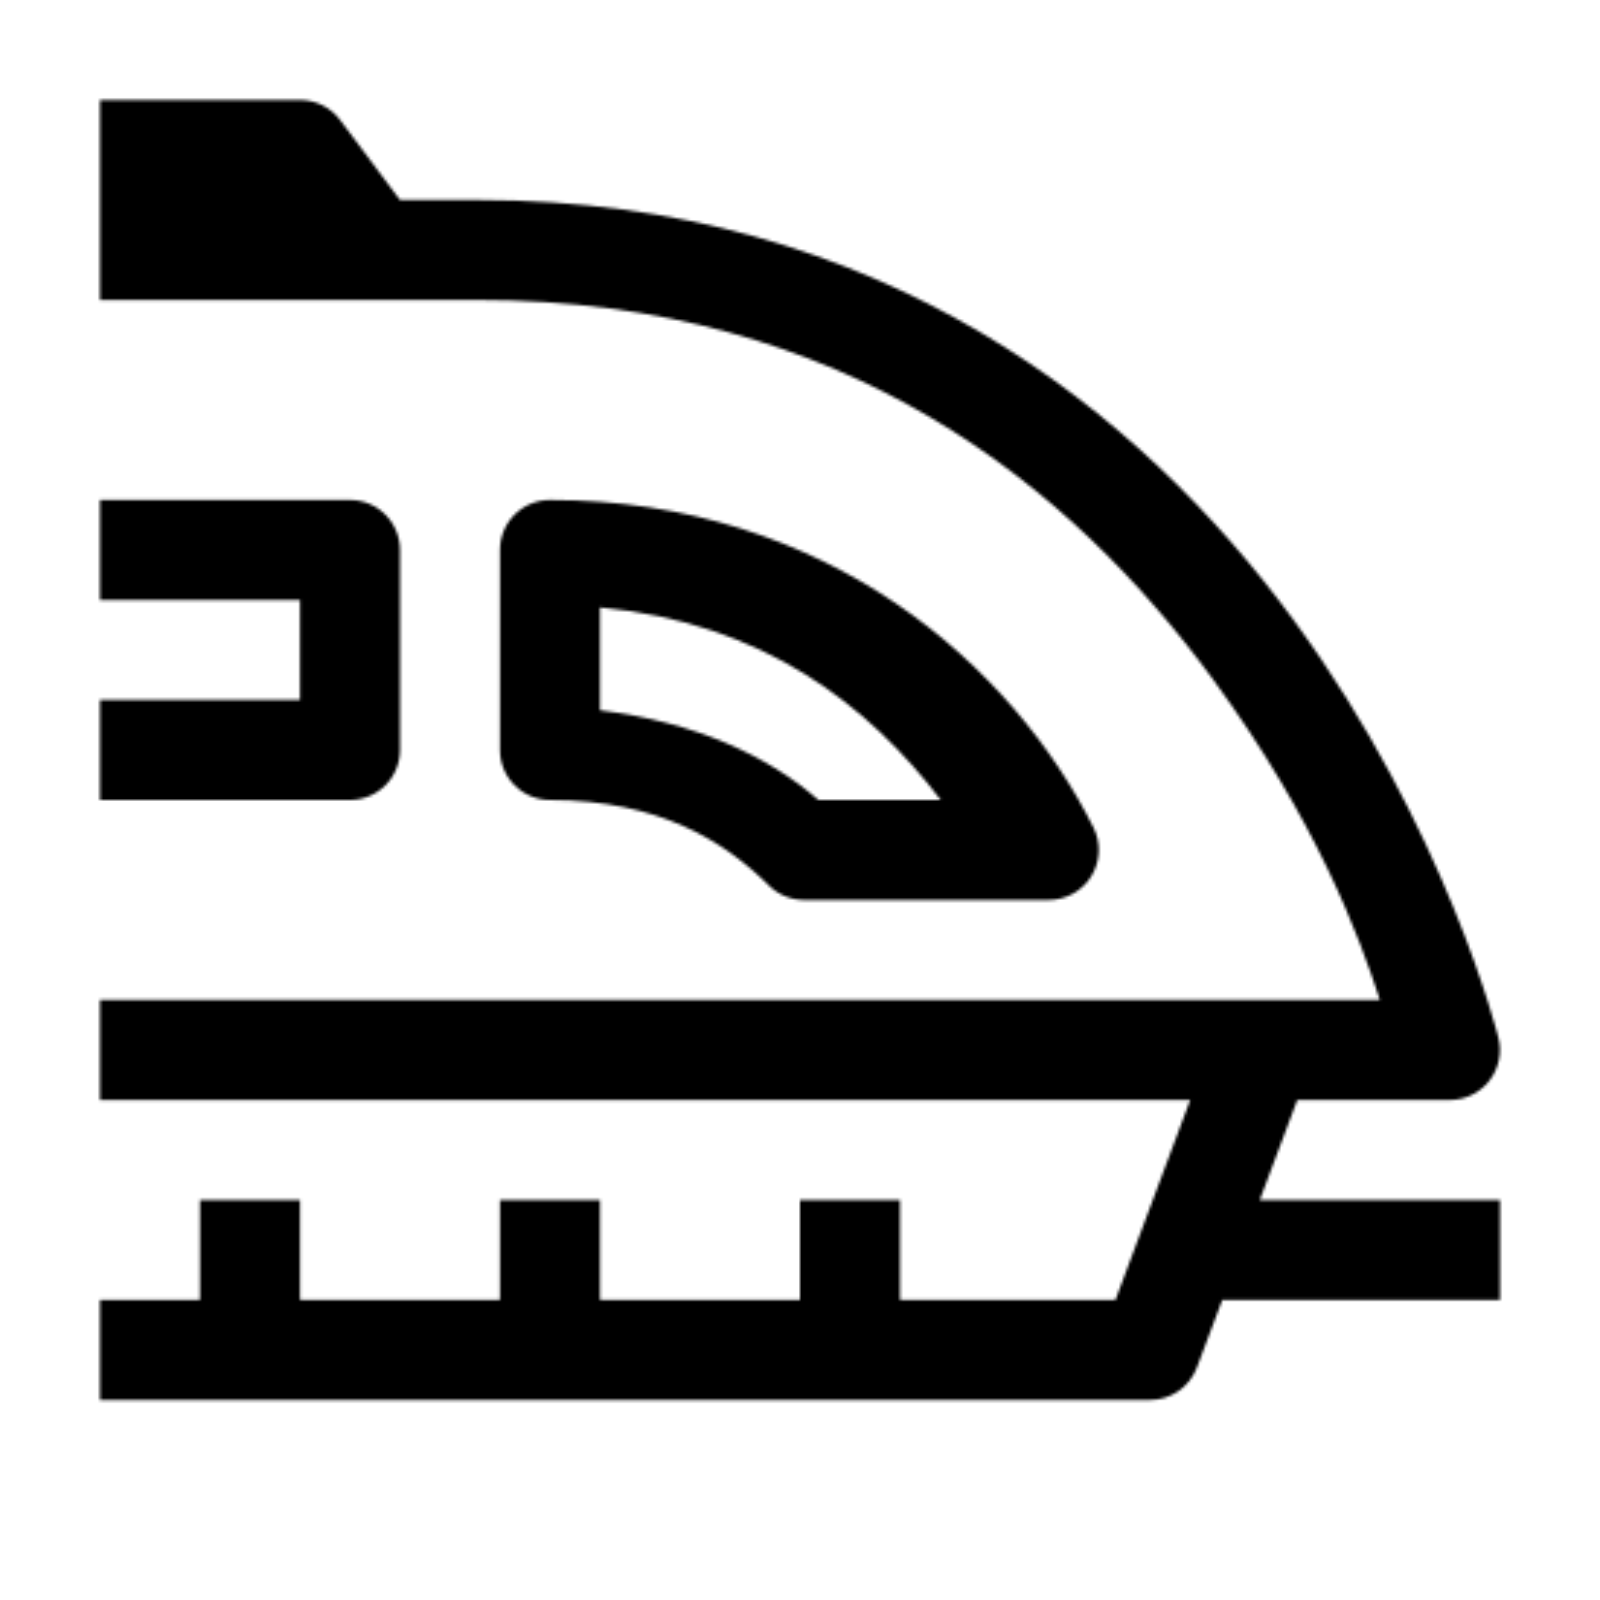 pojazd typu Maglev icon